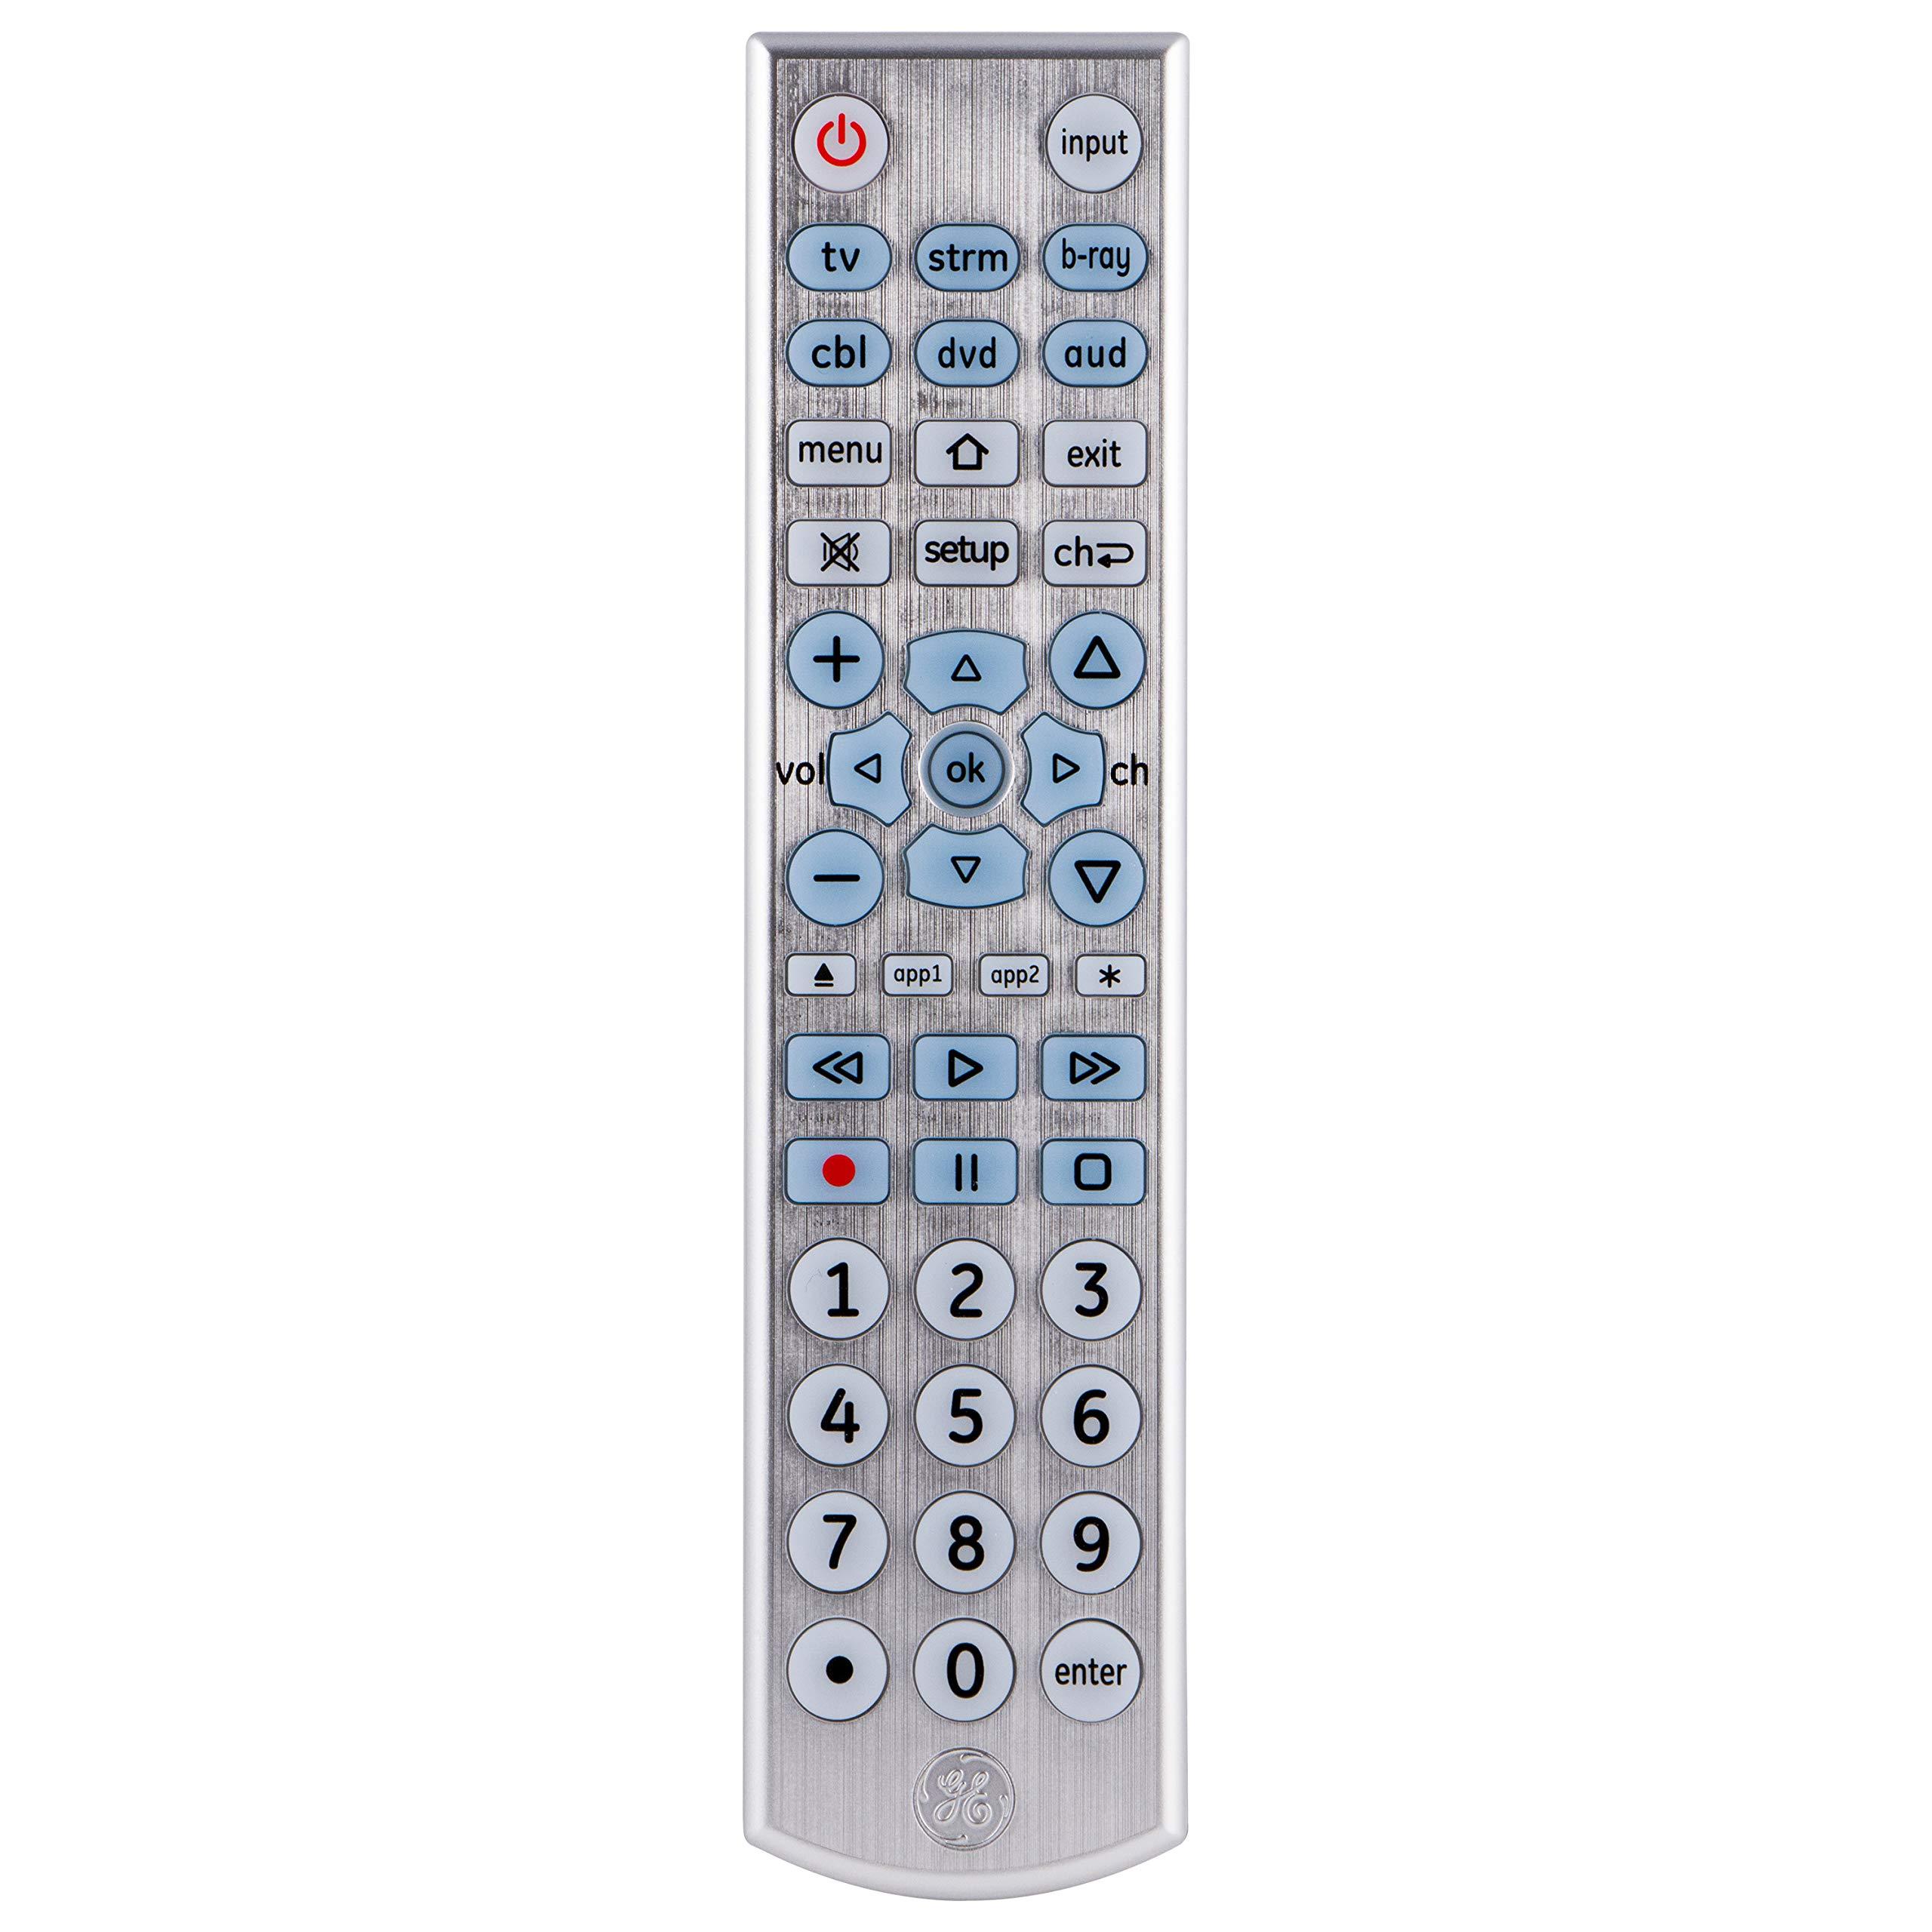 GE 33712 6-Device Big Button Universal Remote Control, Soft-Blue LED Fully Backlit, Designer Series